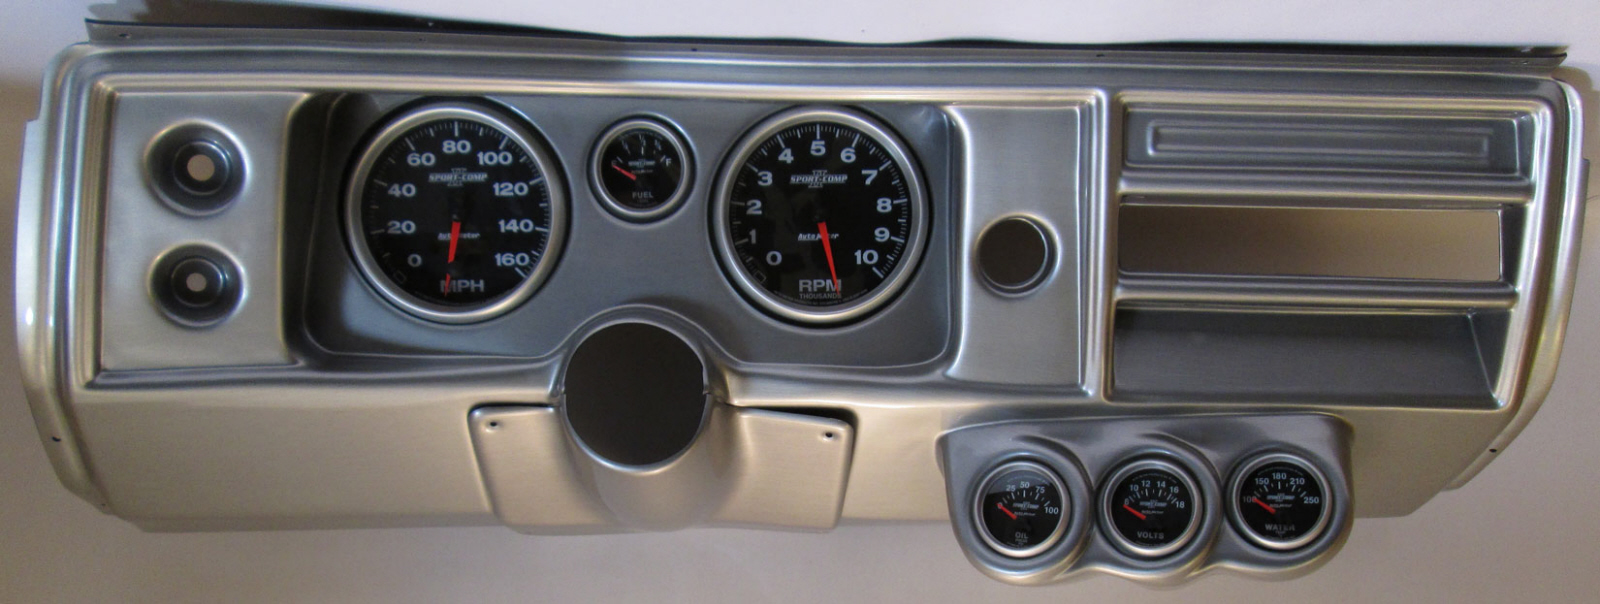 Autometer Sport Comp Ii Electric Oil Pressure Gauge 0163653 Free